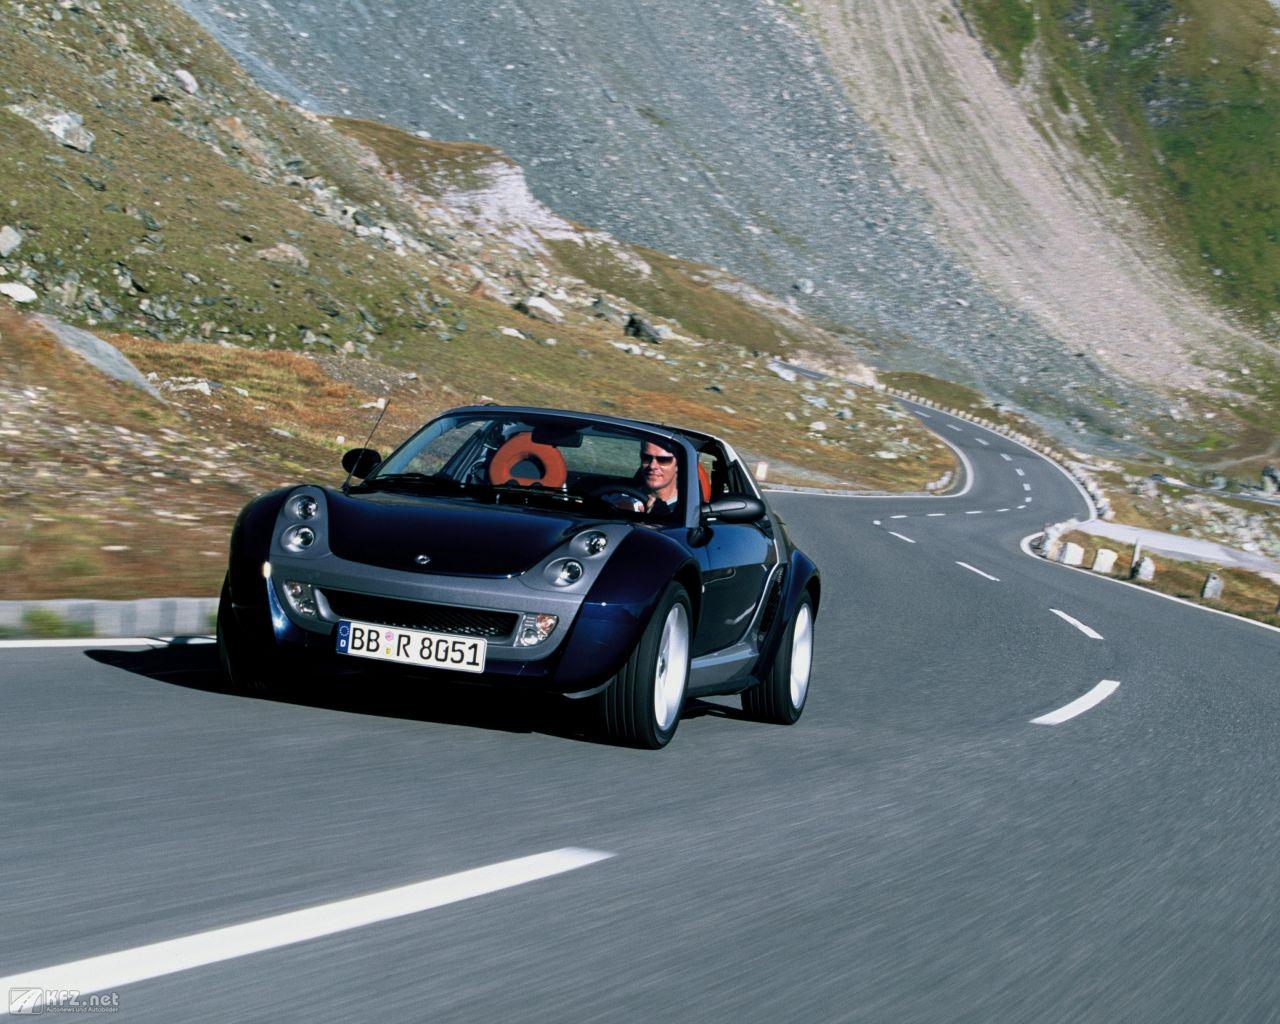 smart-roadster-1280x1024-4